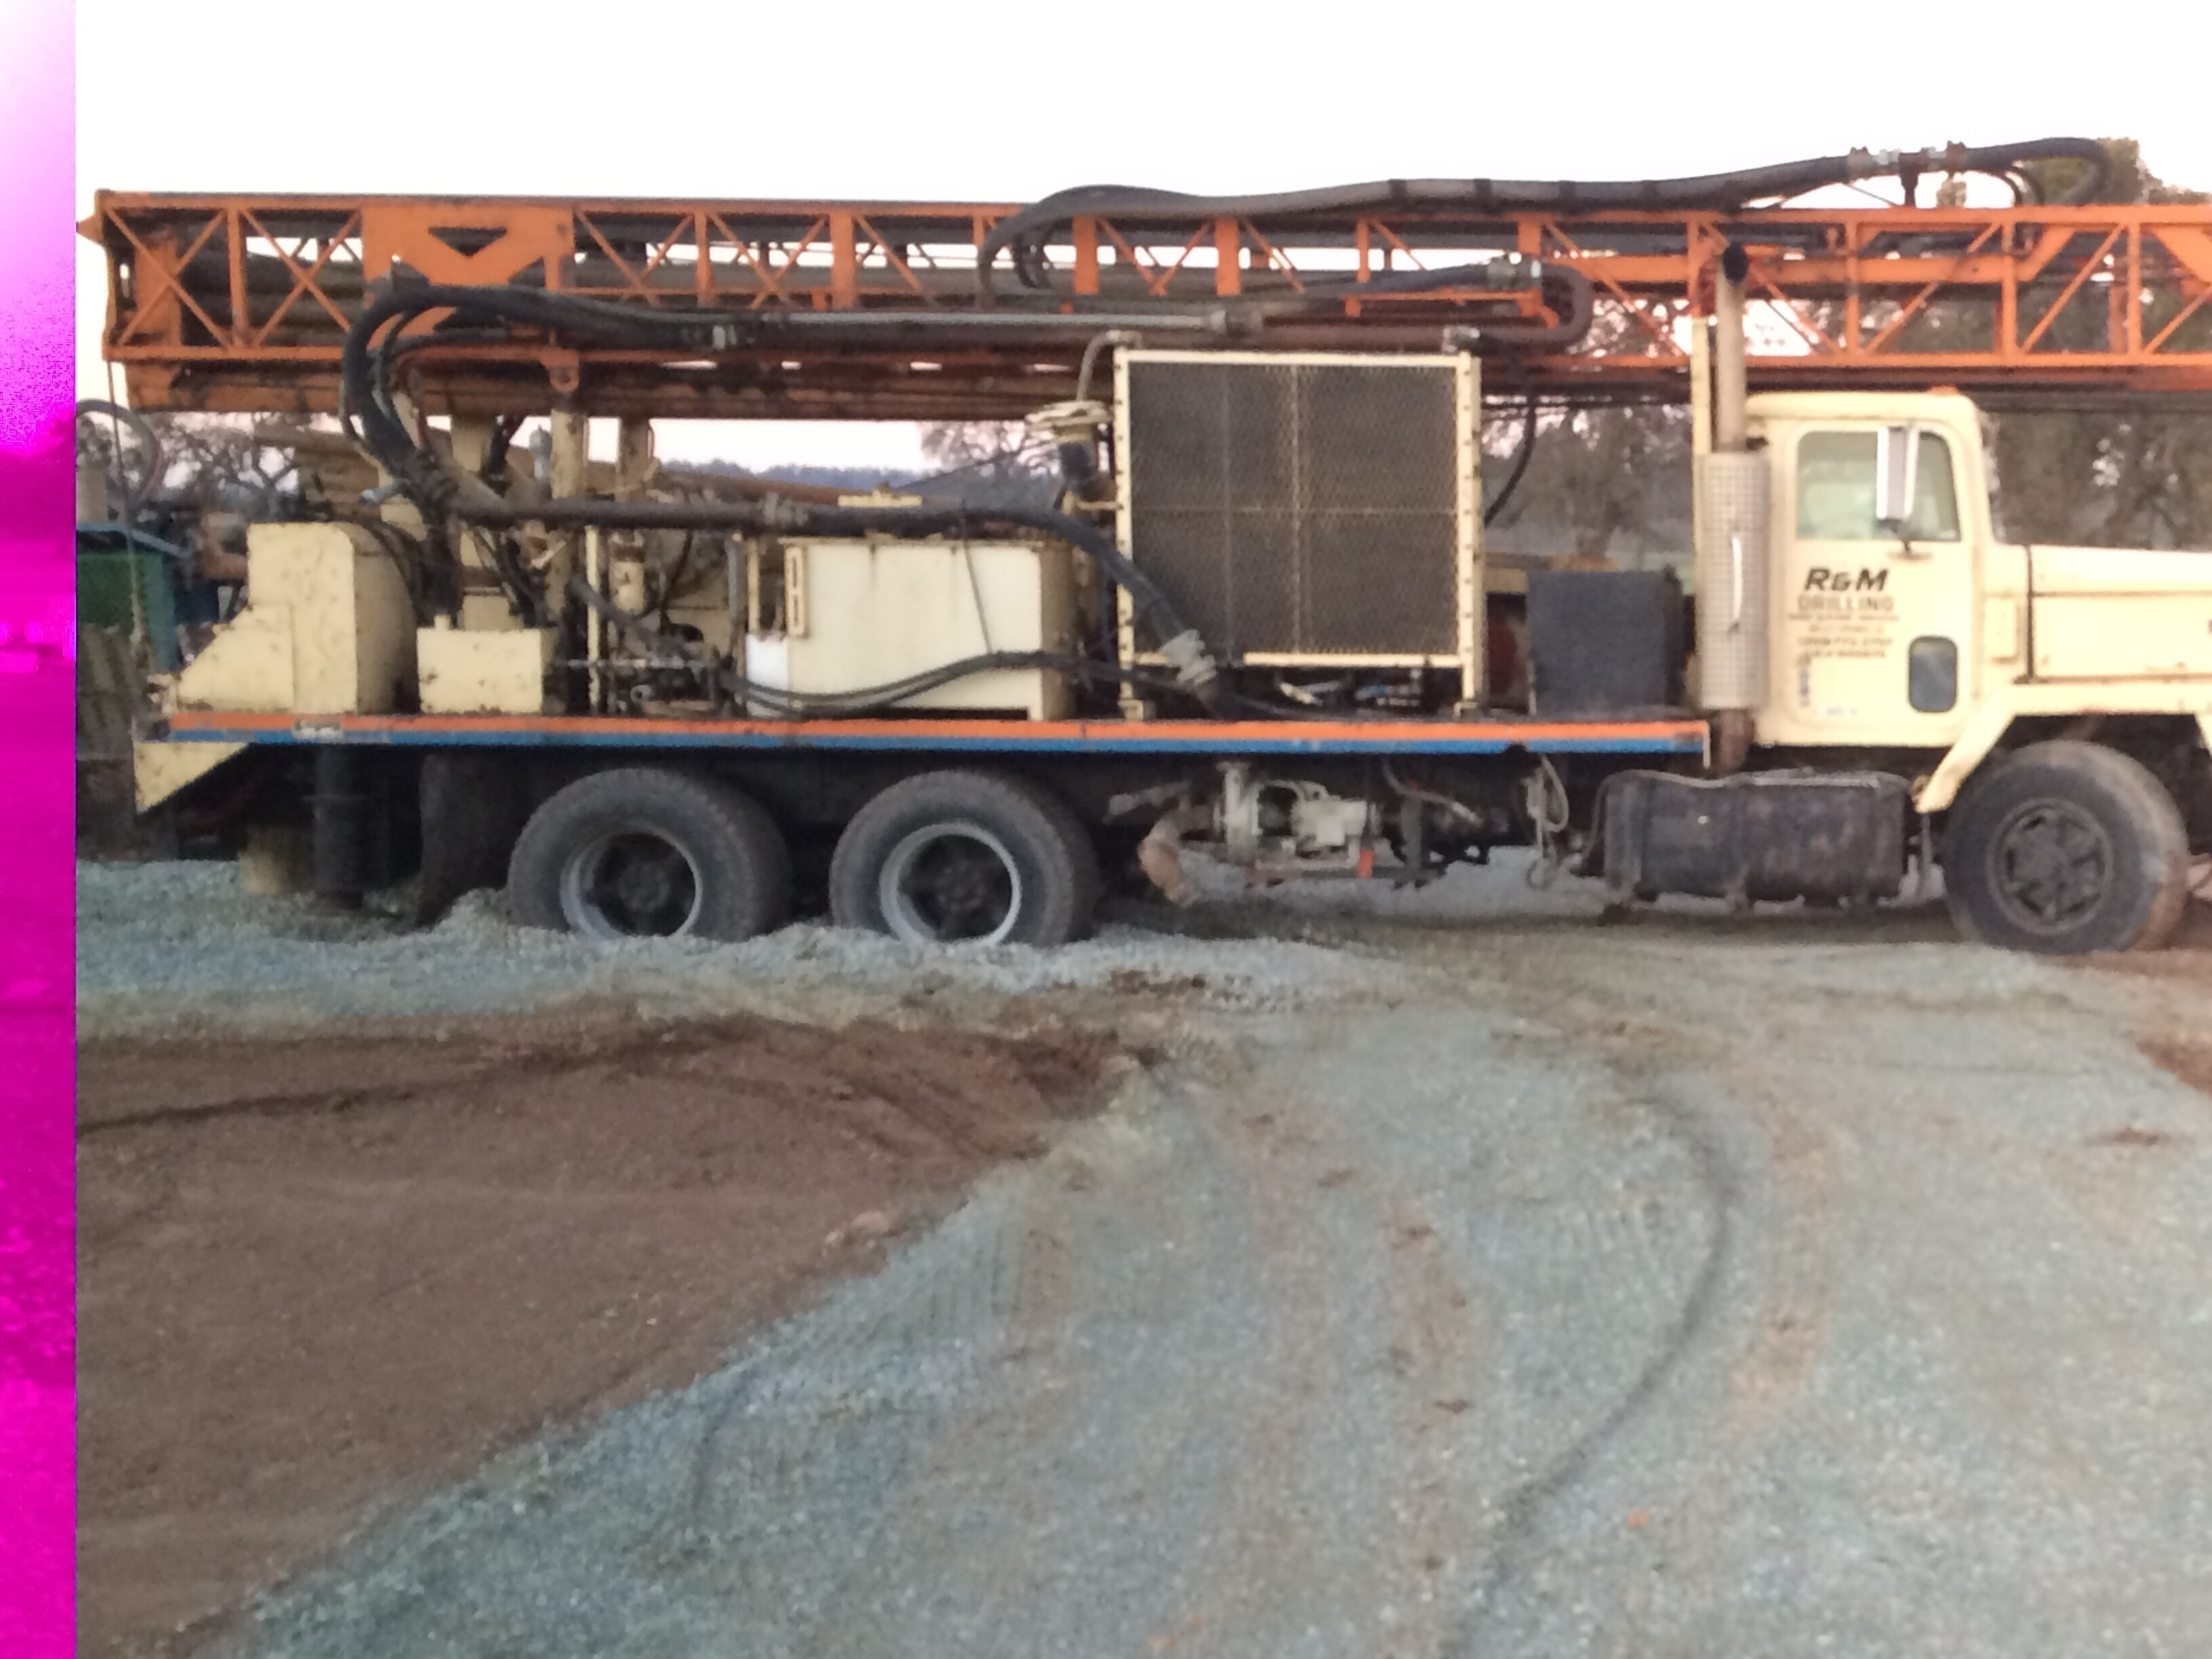 R & M Drilling Inc. image 2